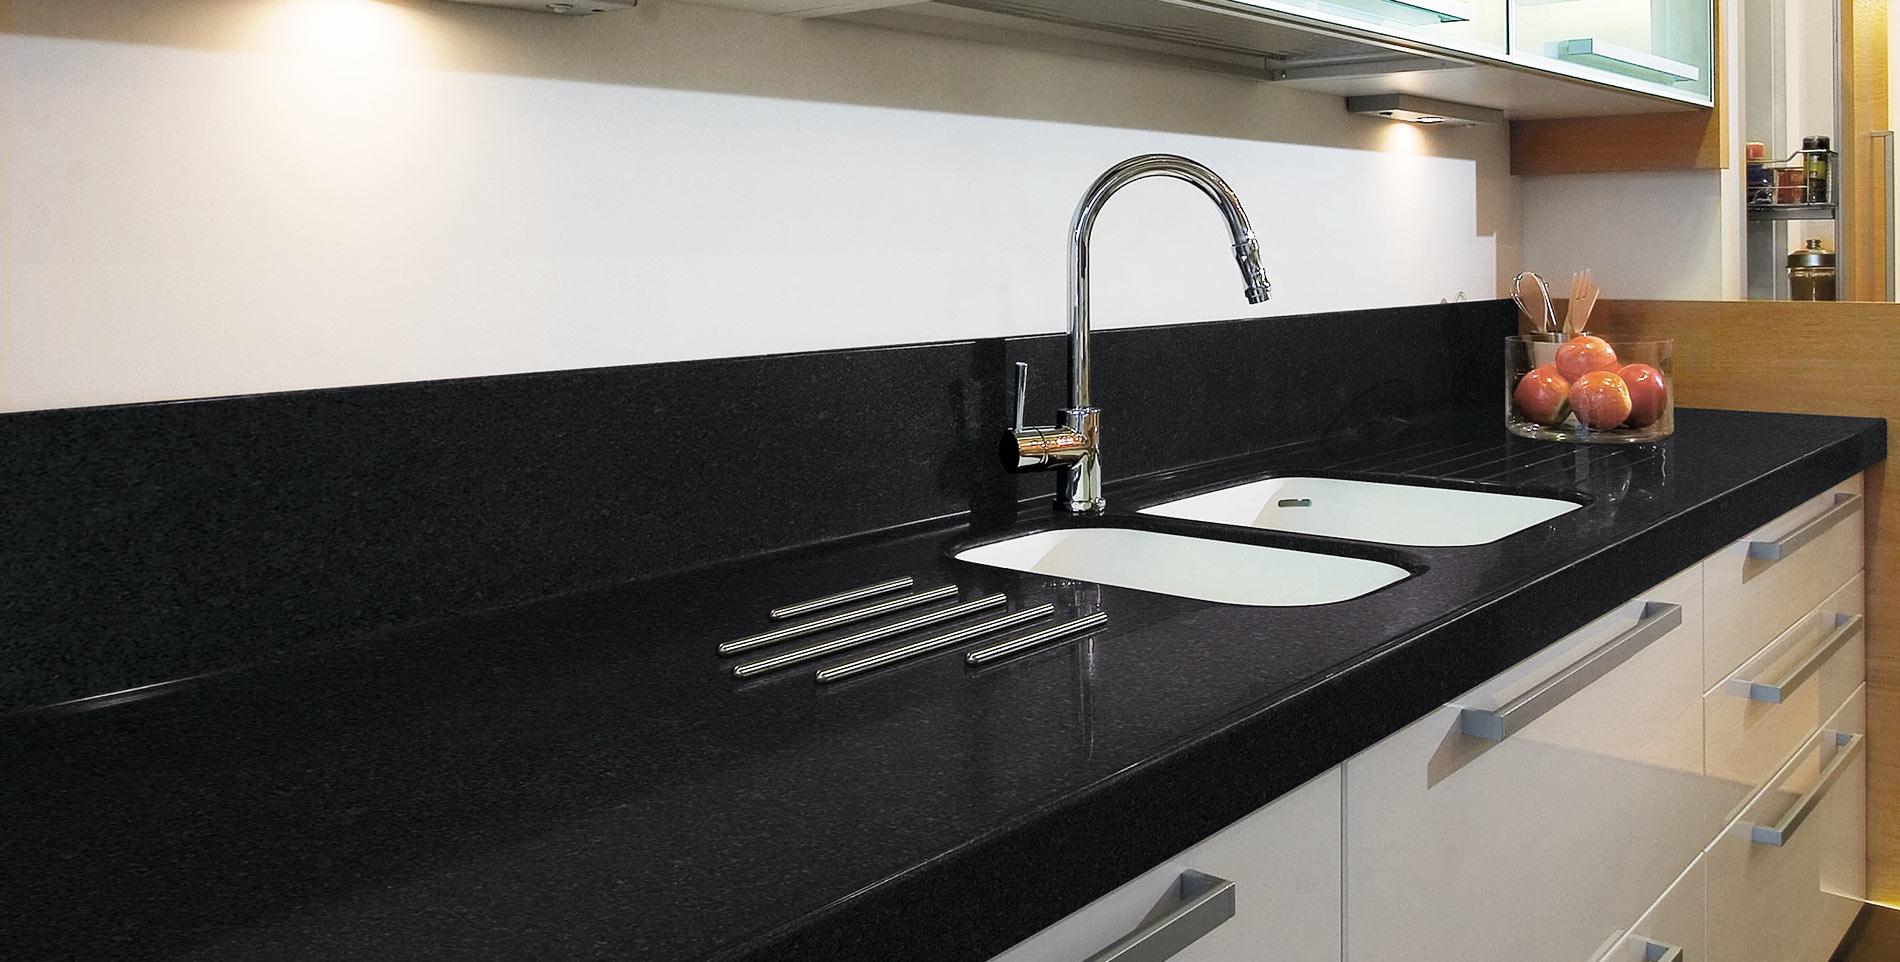 Encimera negra materiales de construcci n para la reparaci n for Cocina blanca encimera negra